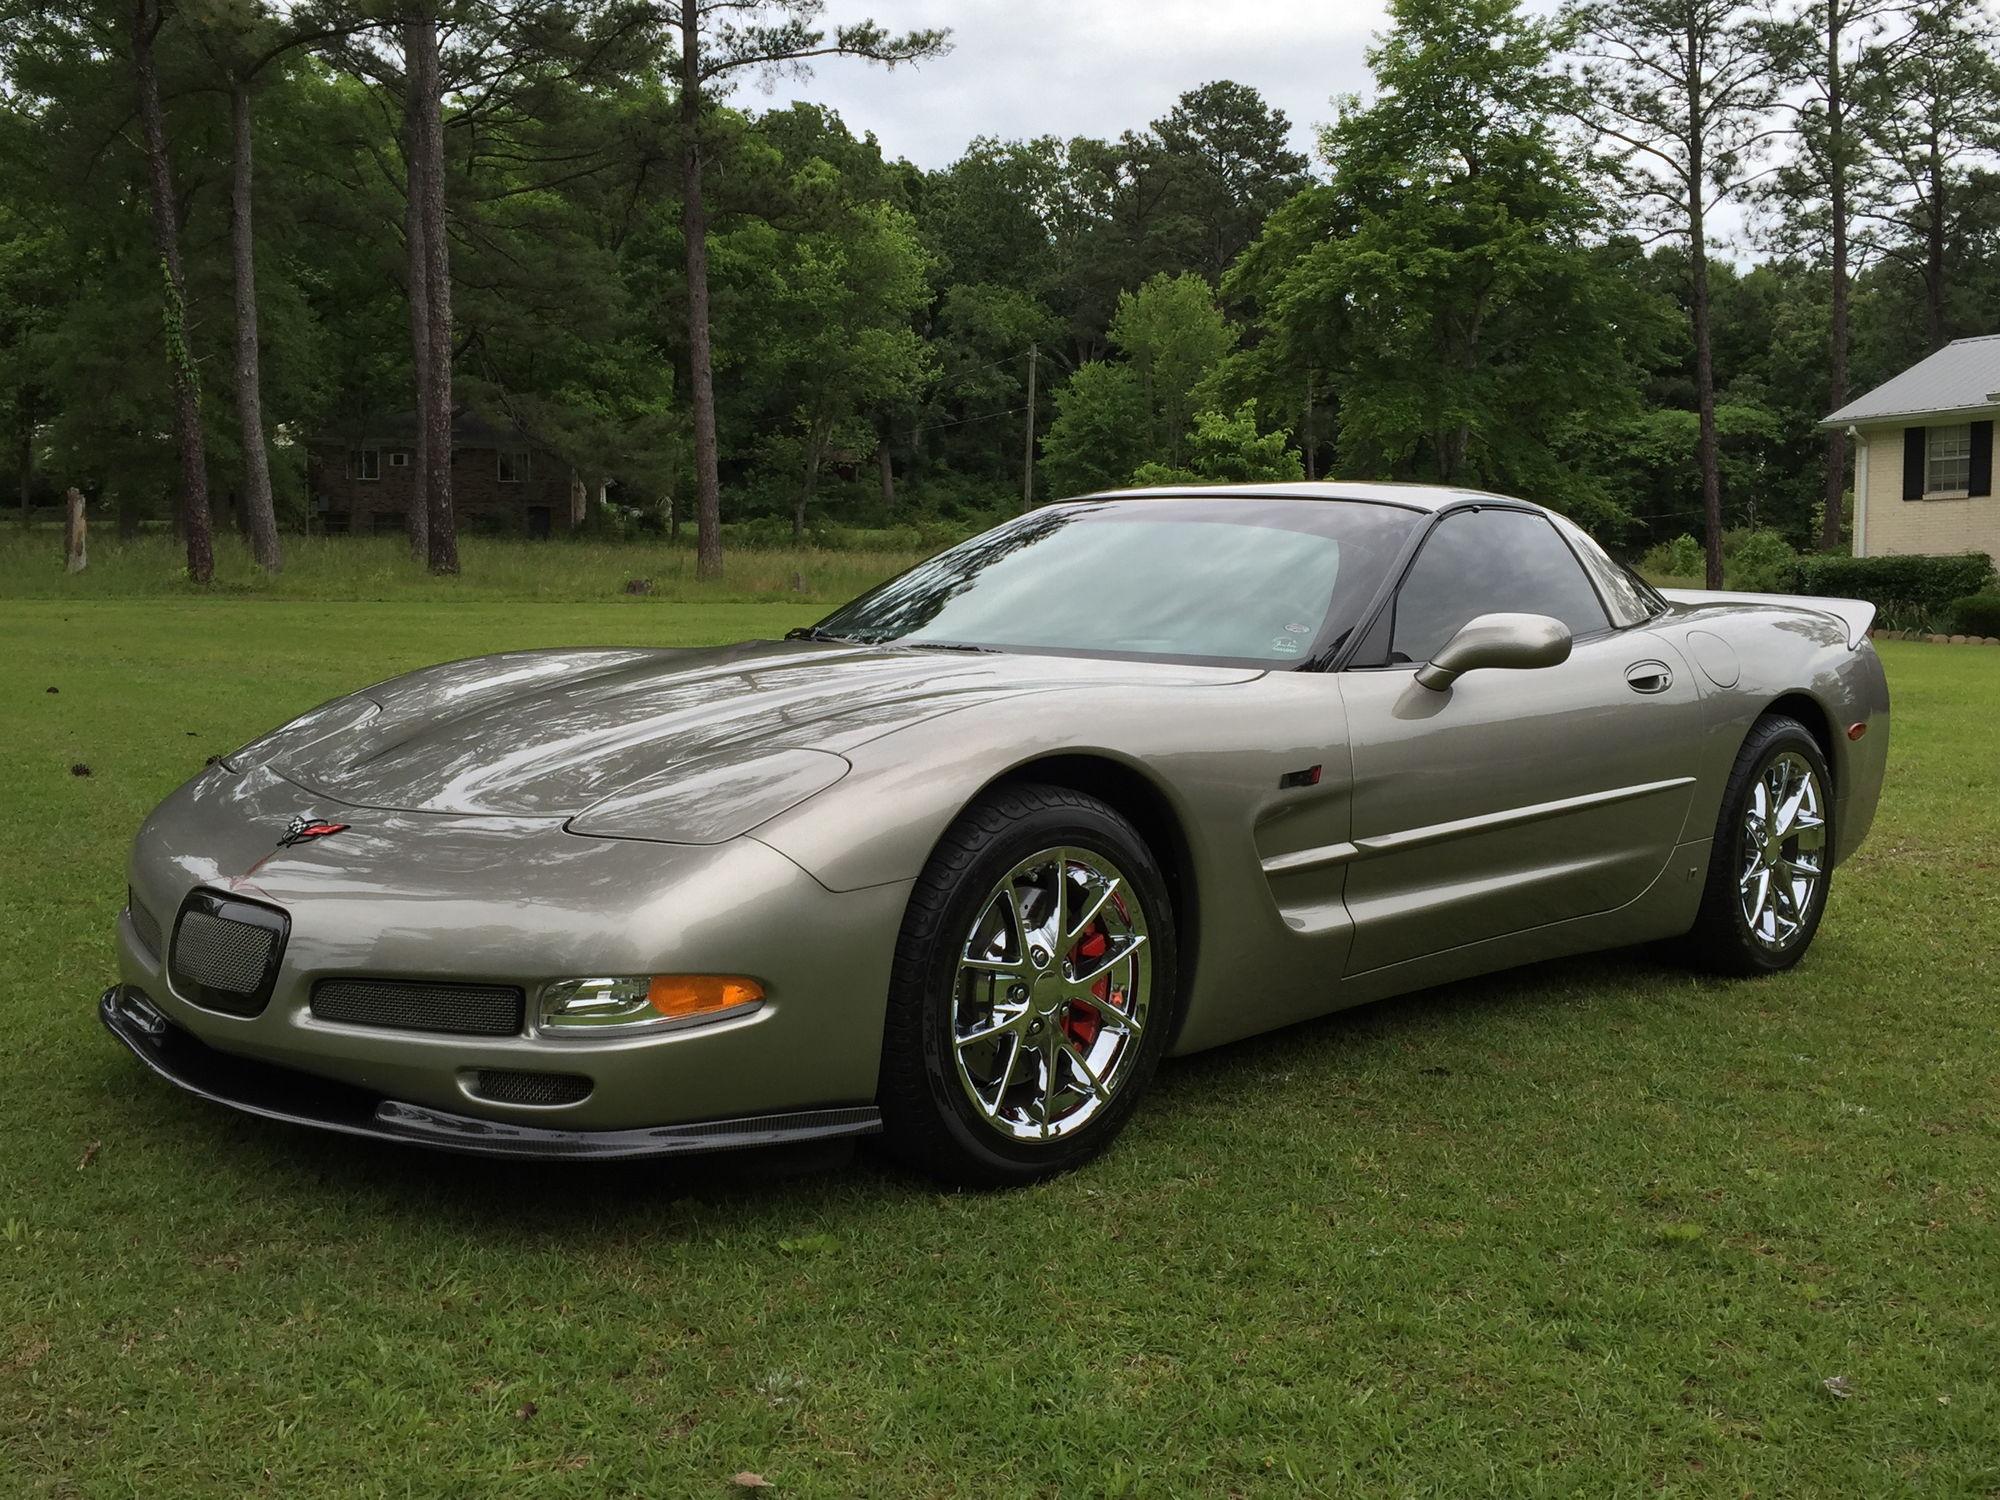 1999 Pewter Metallic Corvette Coupe Turn Key Show Car